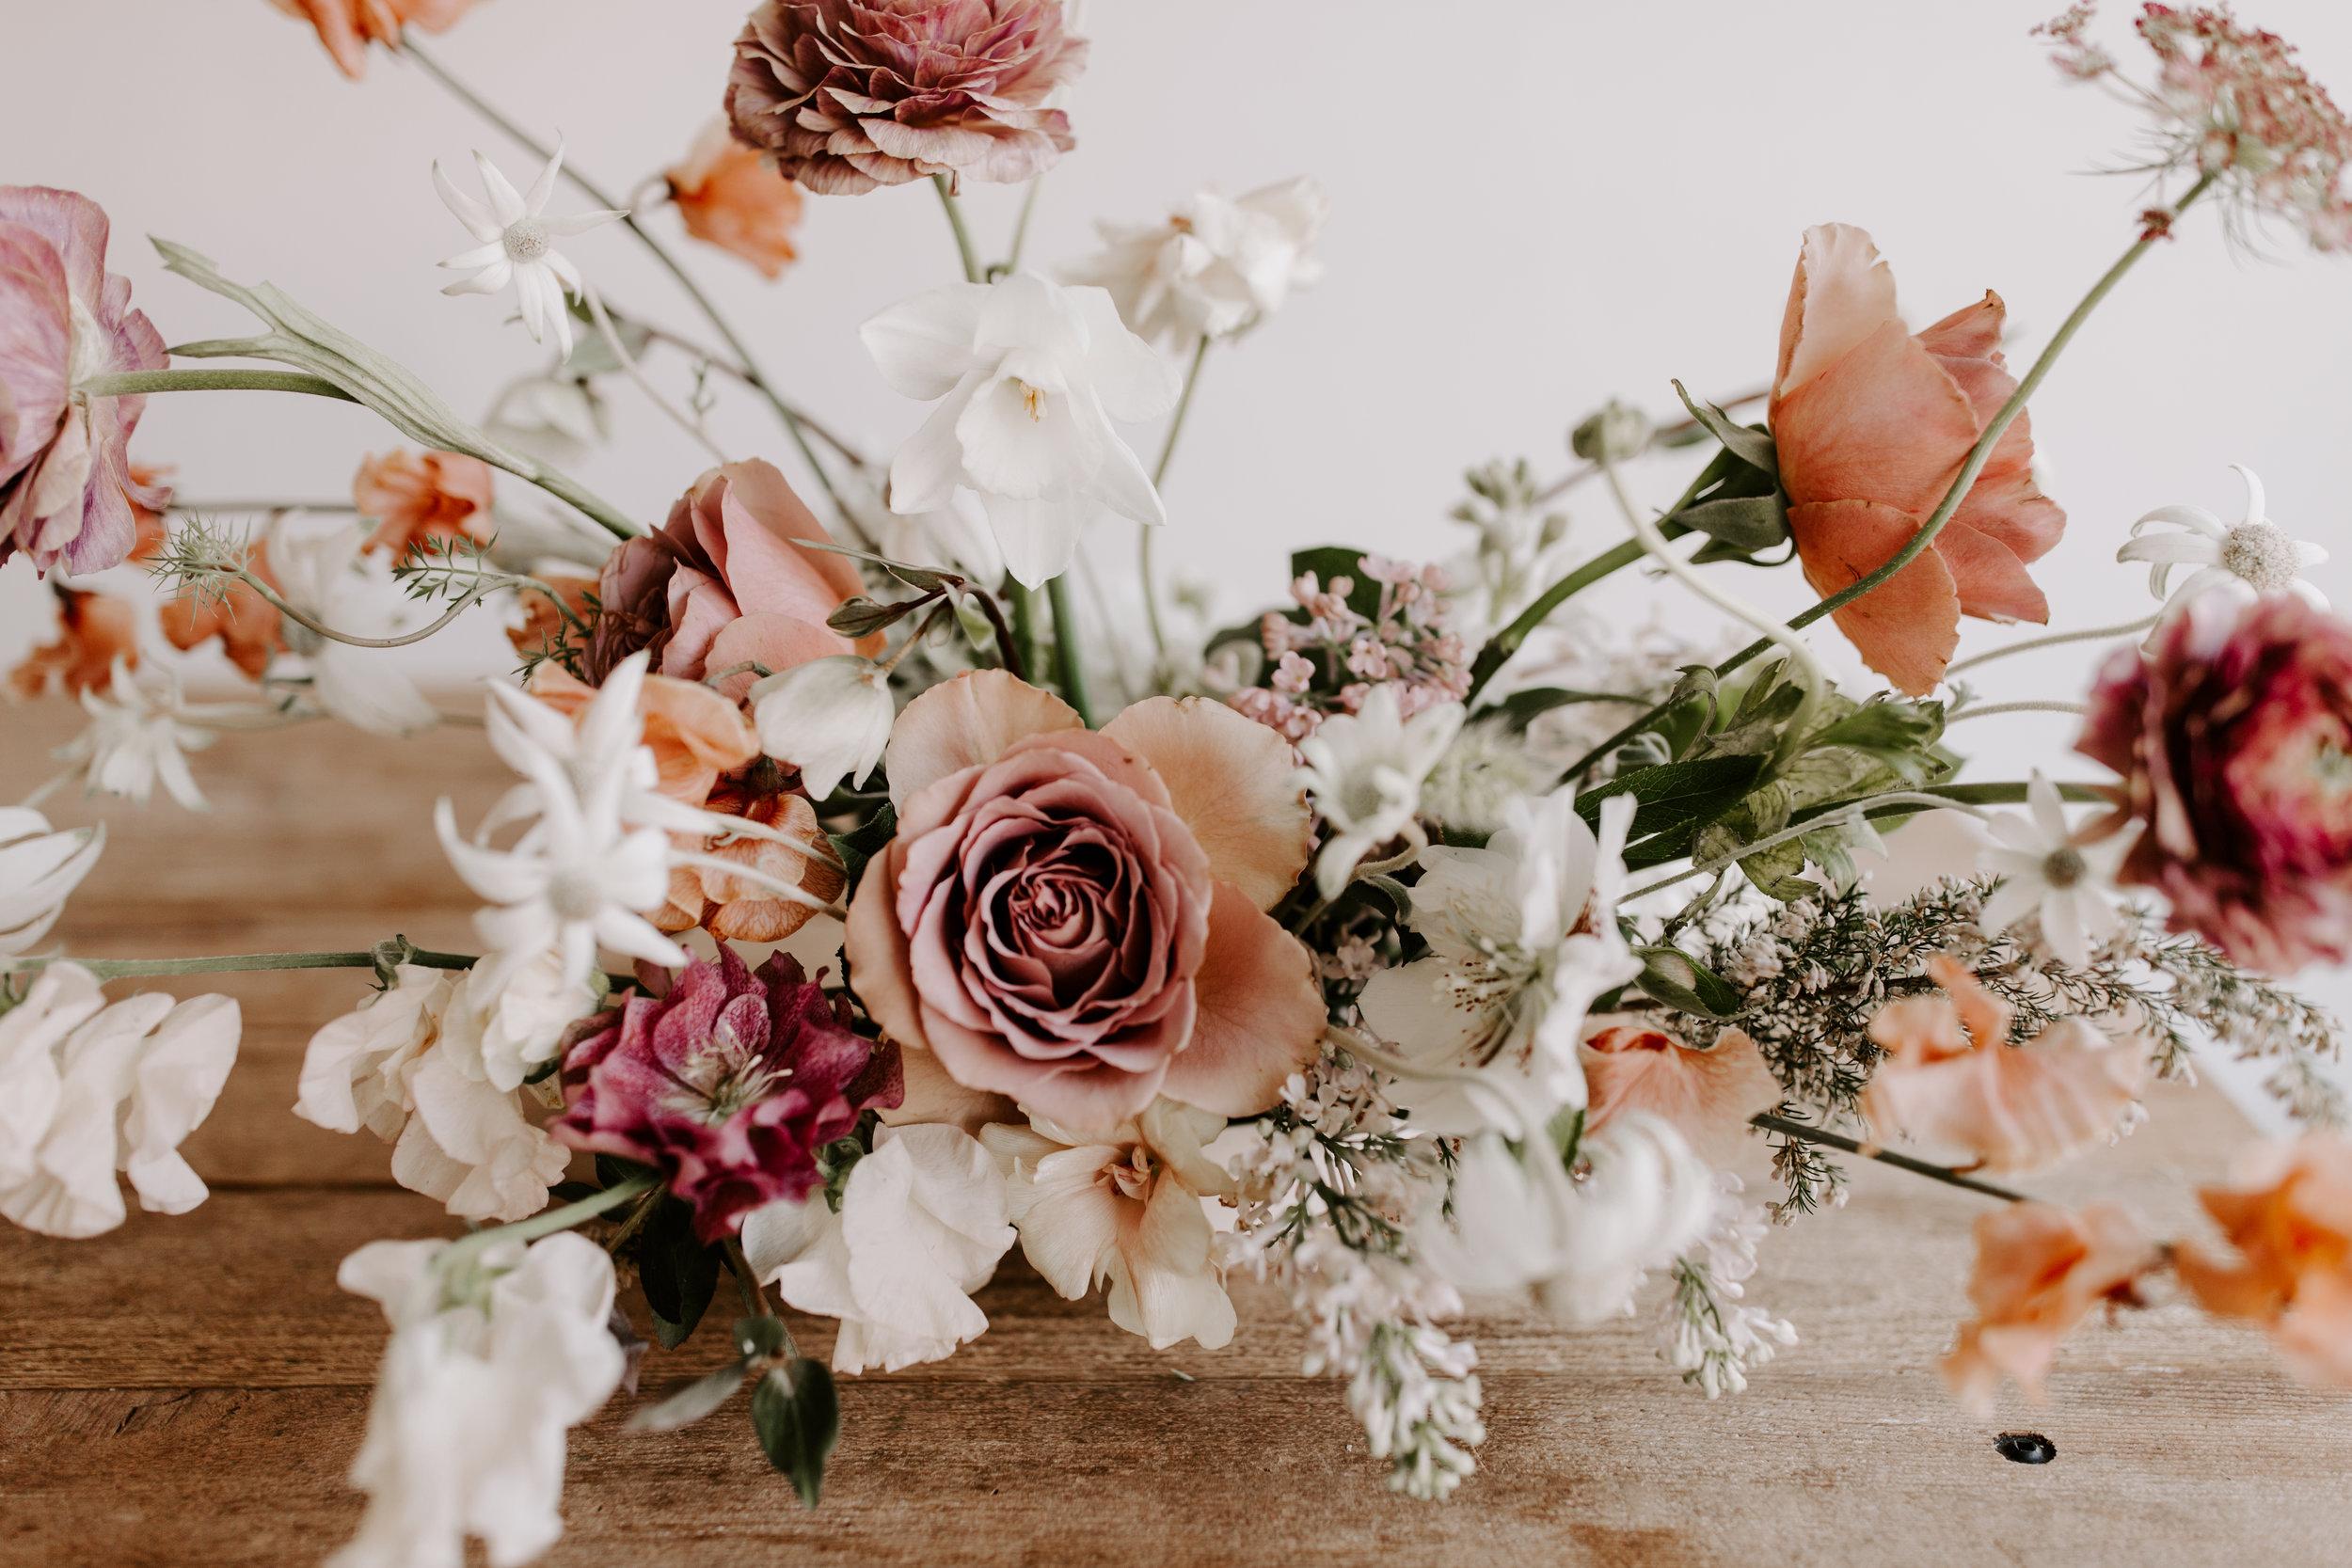 Creative floral arrangement - eversomething.com